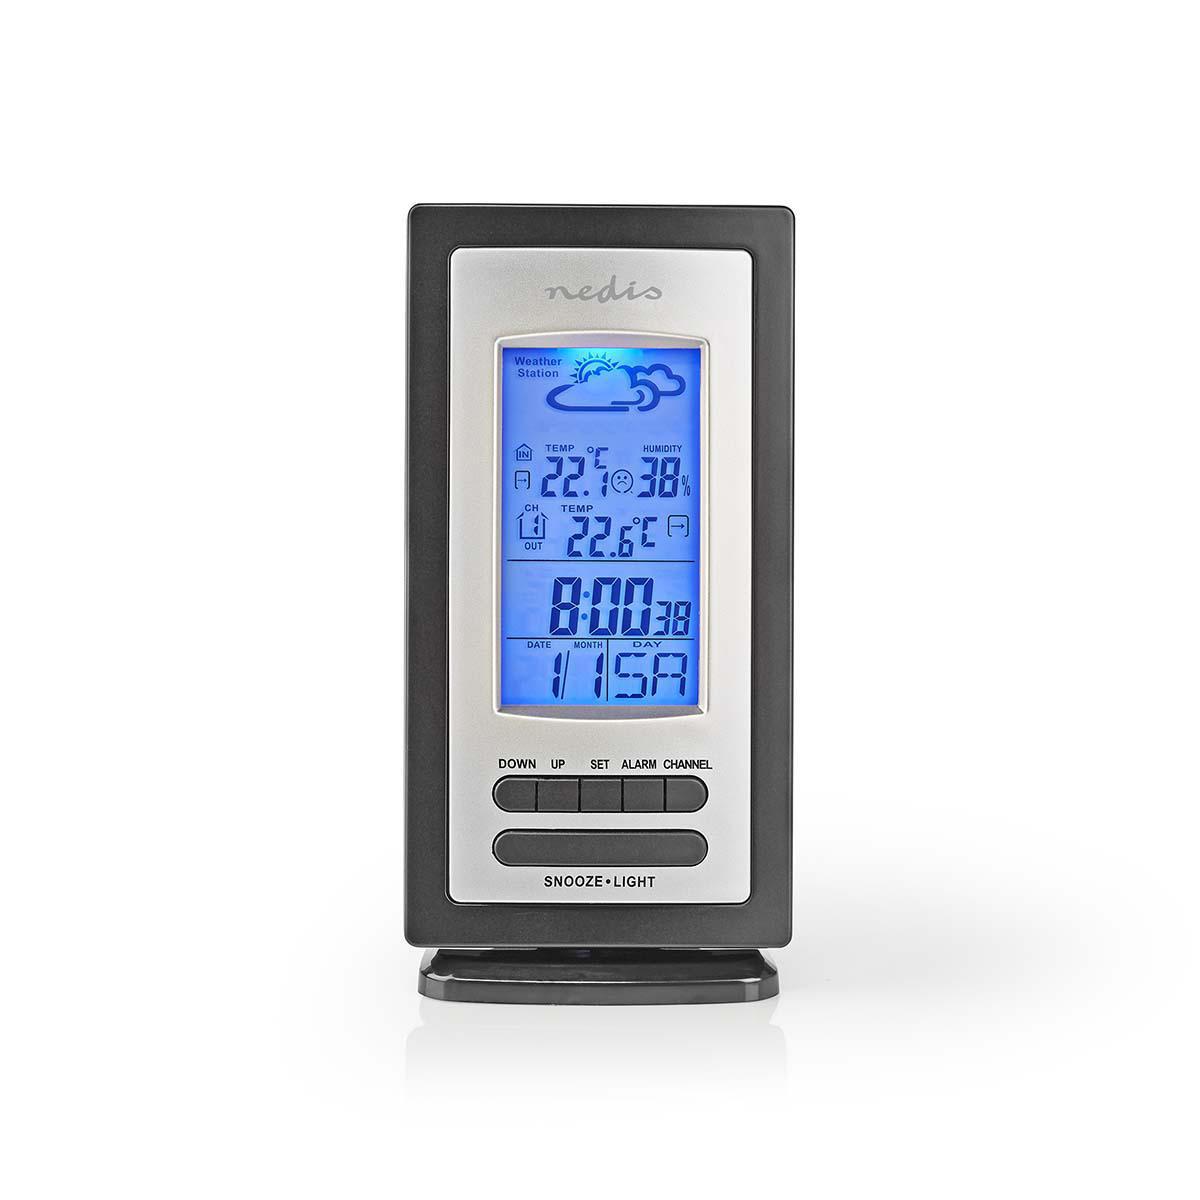 NONAME Accessoire KLEIN HUISHOUDELIJK Airconditioning-Ventilator-Luchtbevochtiger Accessoire Accesso